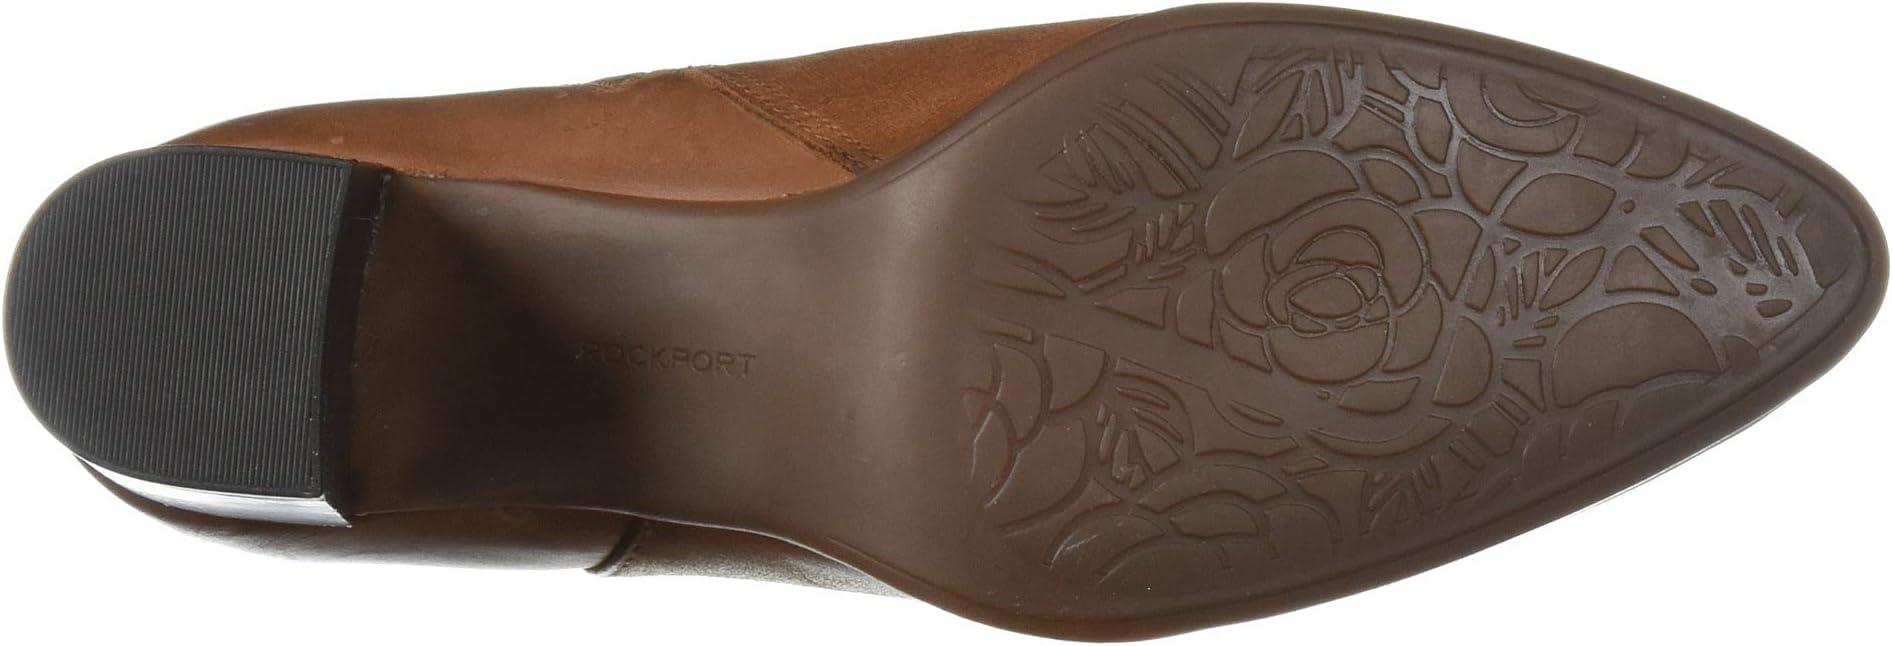 Rockport Camdyn Bootie | Women's shoes | 2020 Newest